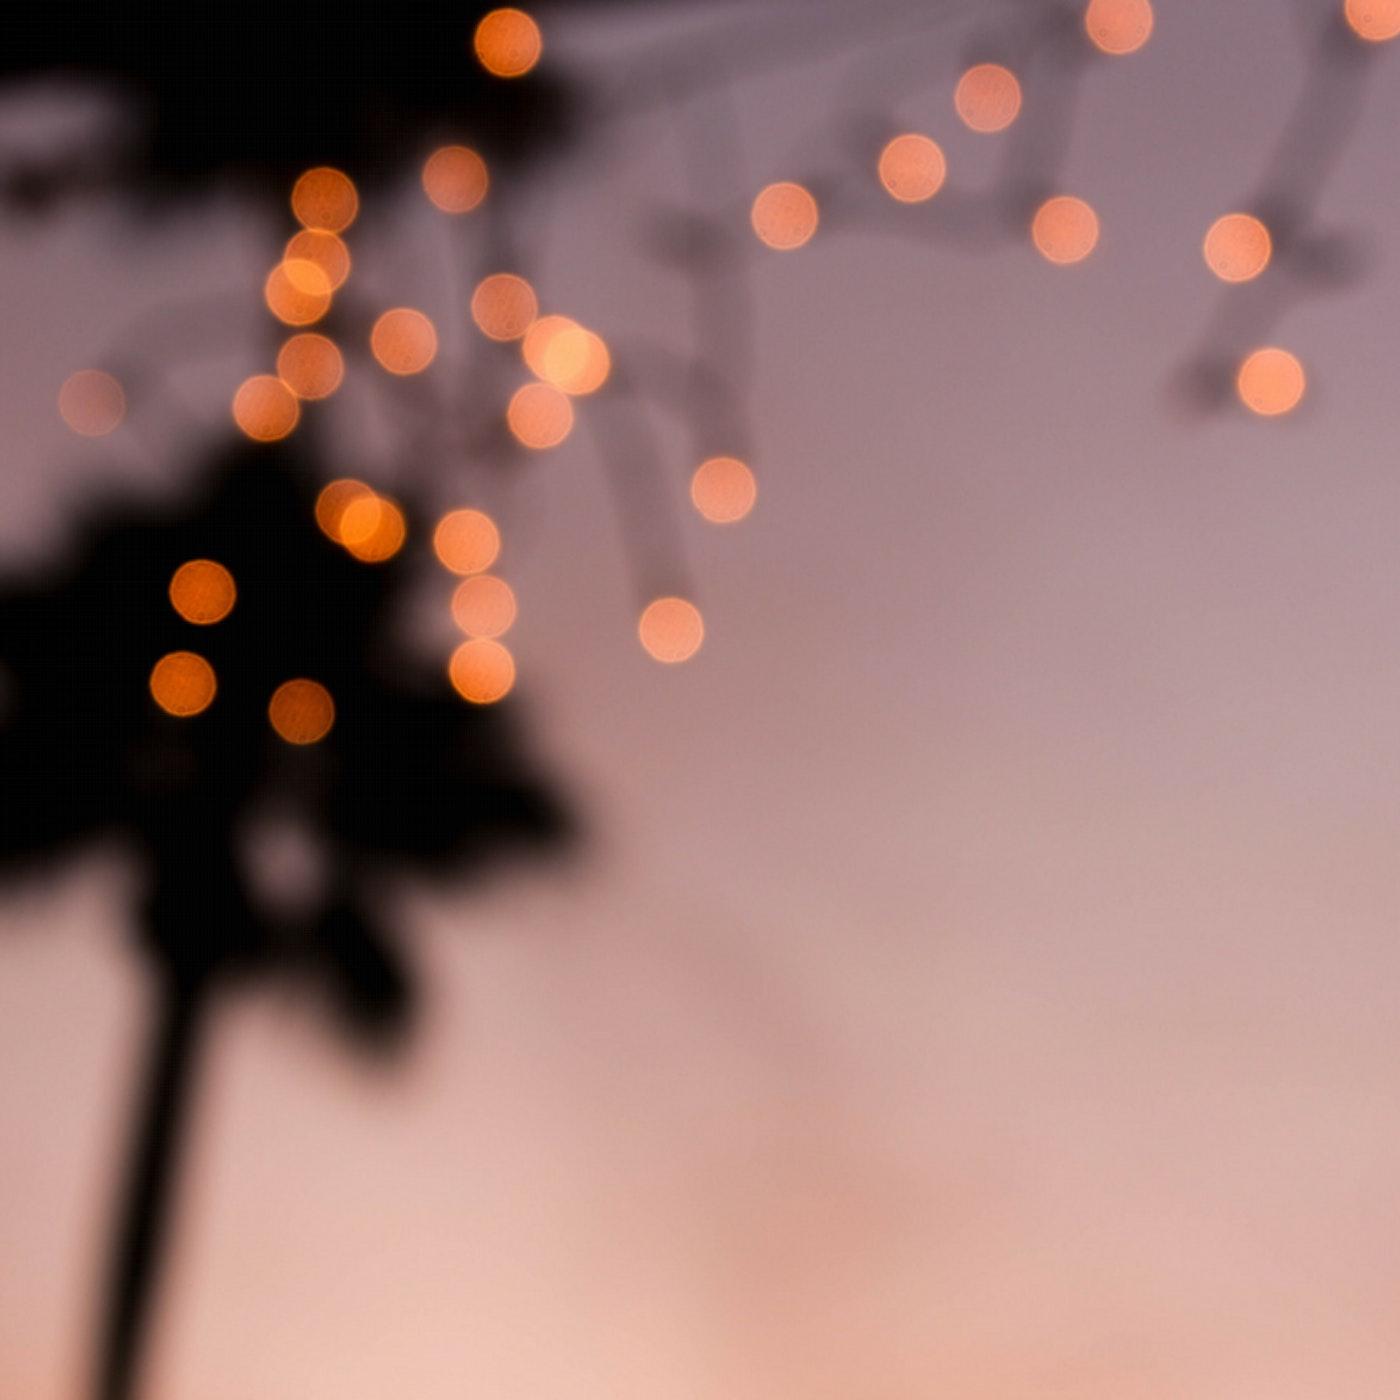 Lightsss